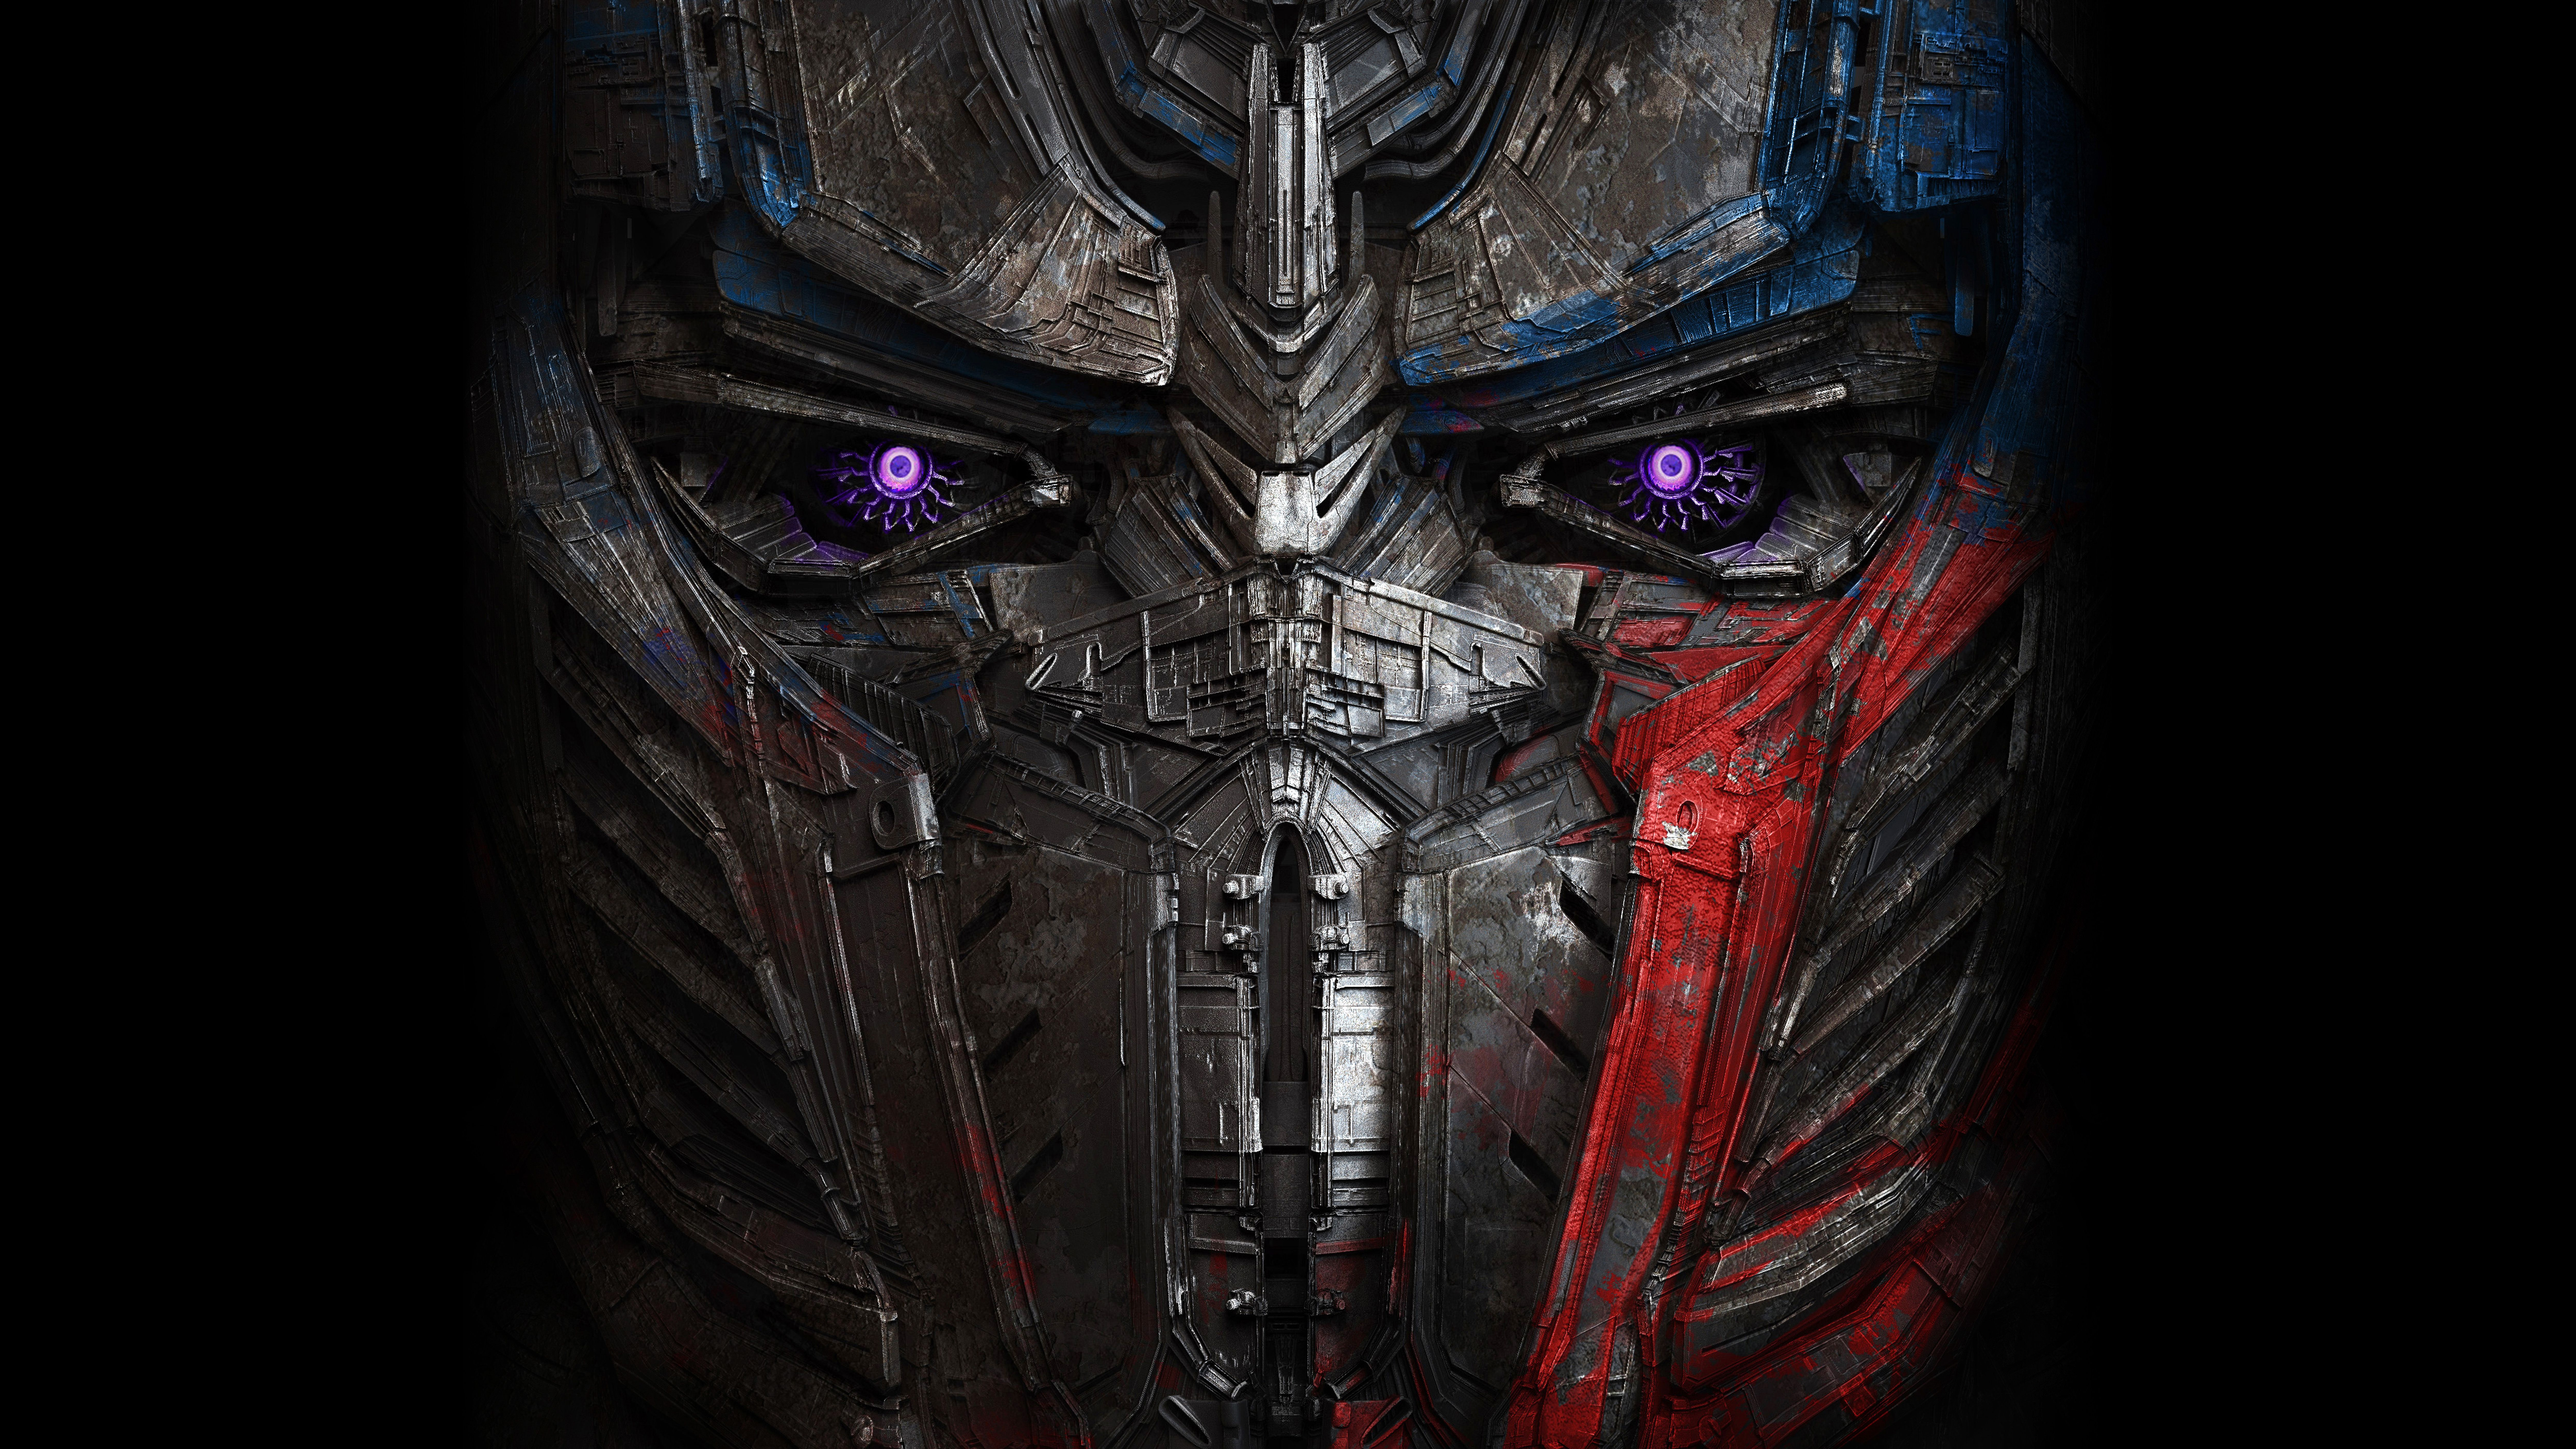 K Ultra Hd Optimus Prime Wallpapers Hd Desktop Backgrounds Last Knights Transformers Movie Transformers 5